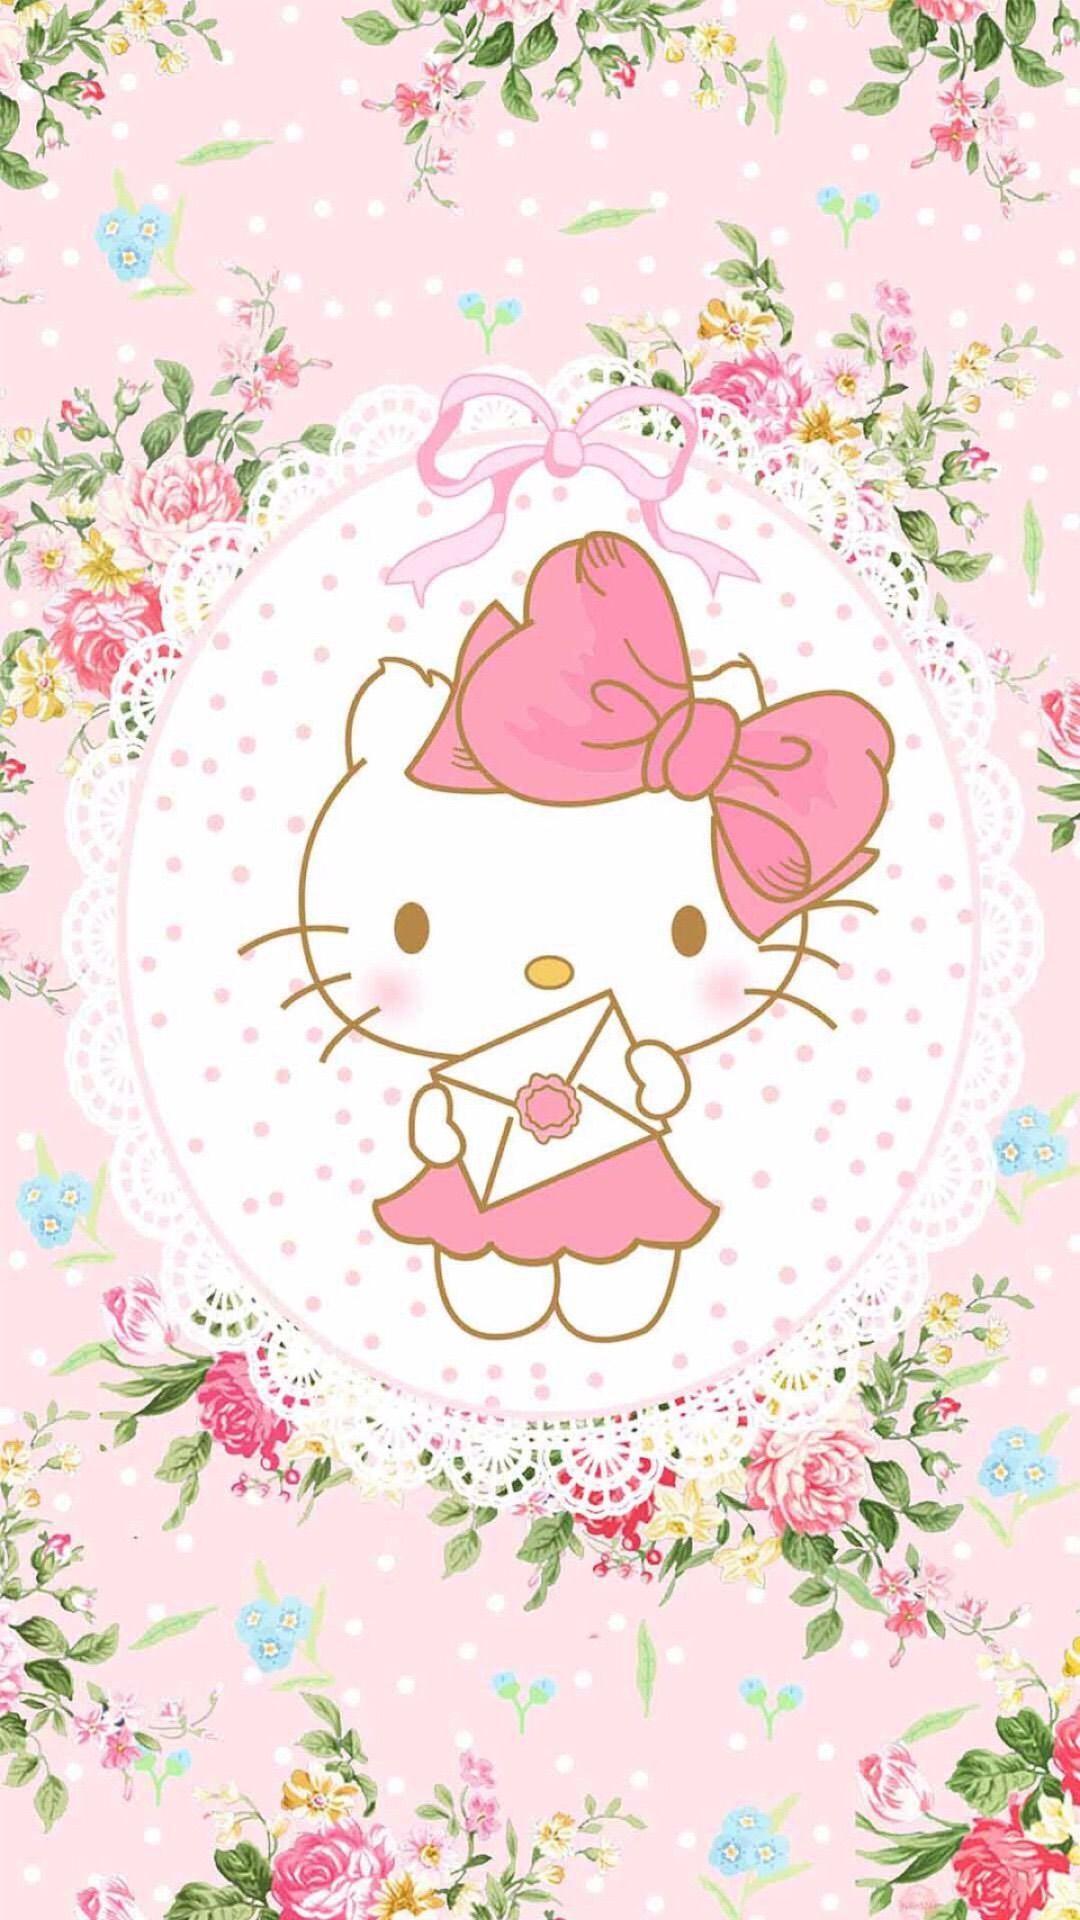 Download Wallpaper Hello Kitty Wall - 9f299f056fef77ab8fc096ca4dfde55f  Snapshot_869573.jpg